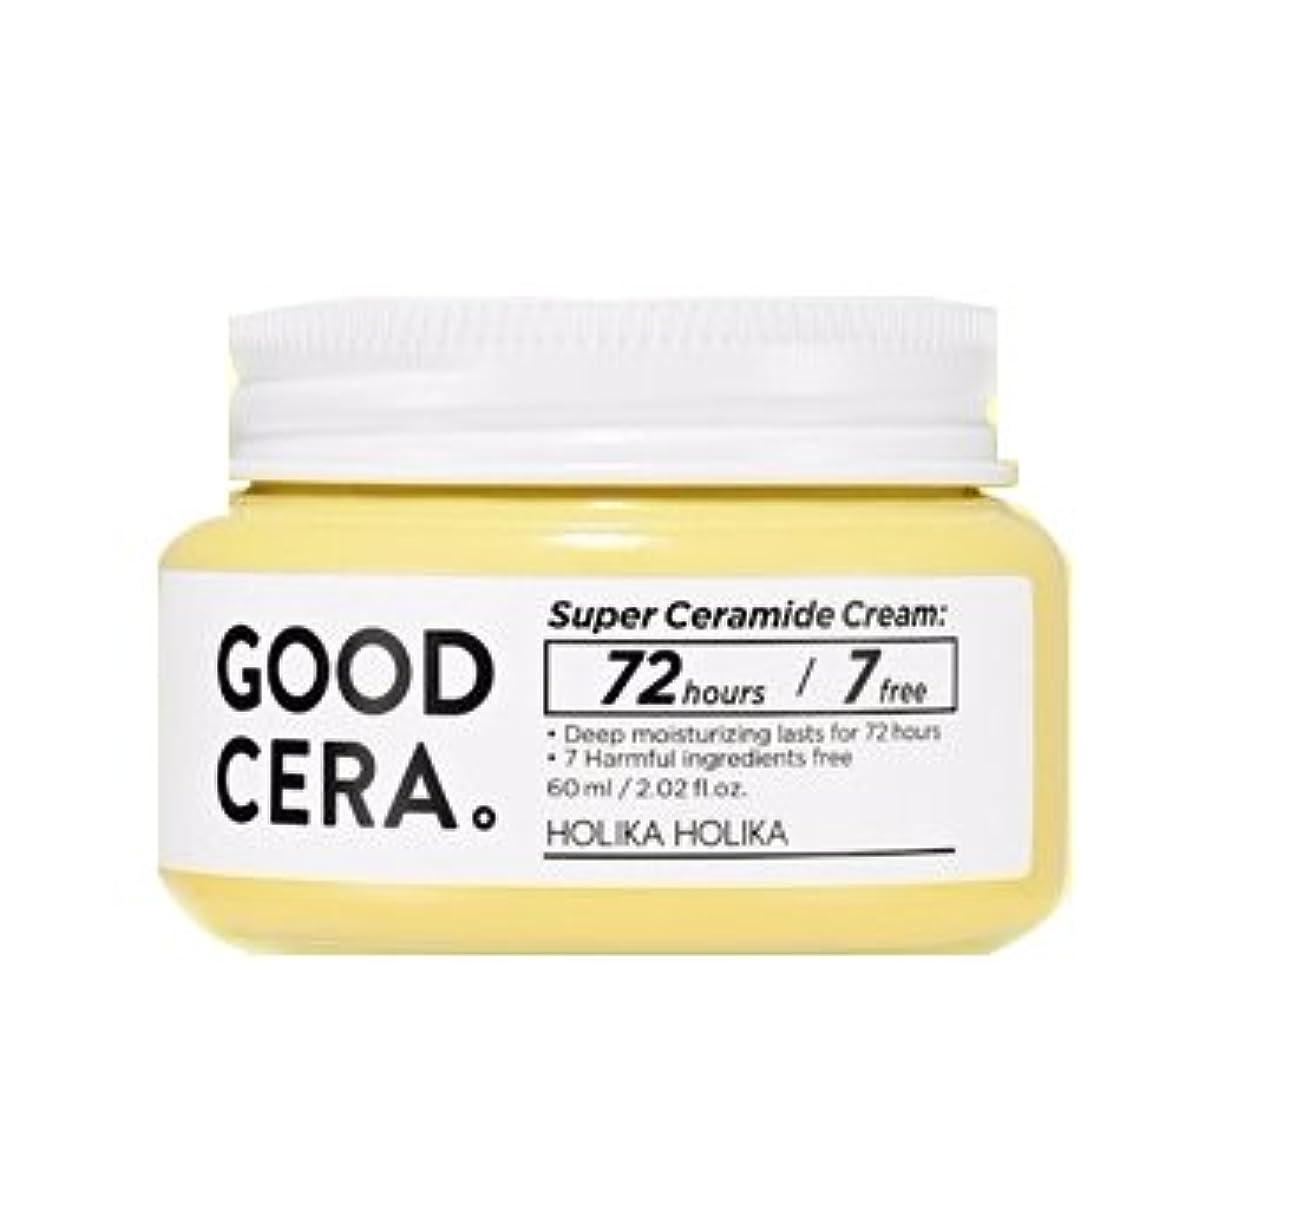 [NEW] ホリカホリカ スーパーセラミドクリーム 60ml / HOLIKA HOLIKA Super Ceramide Cream [並行輸入品]